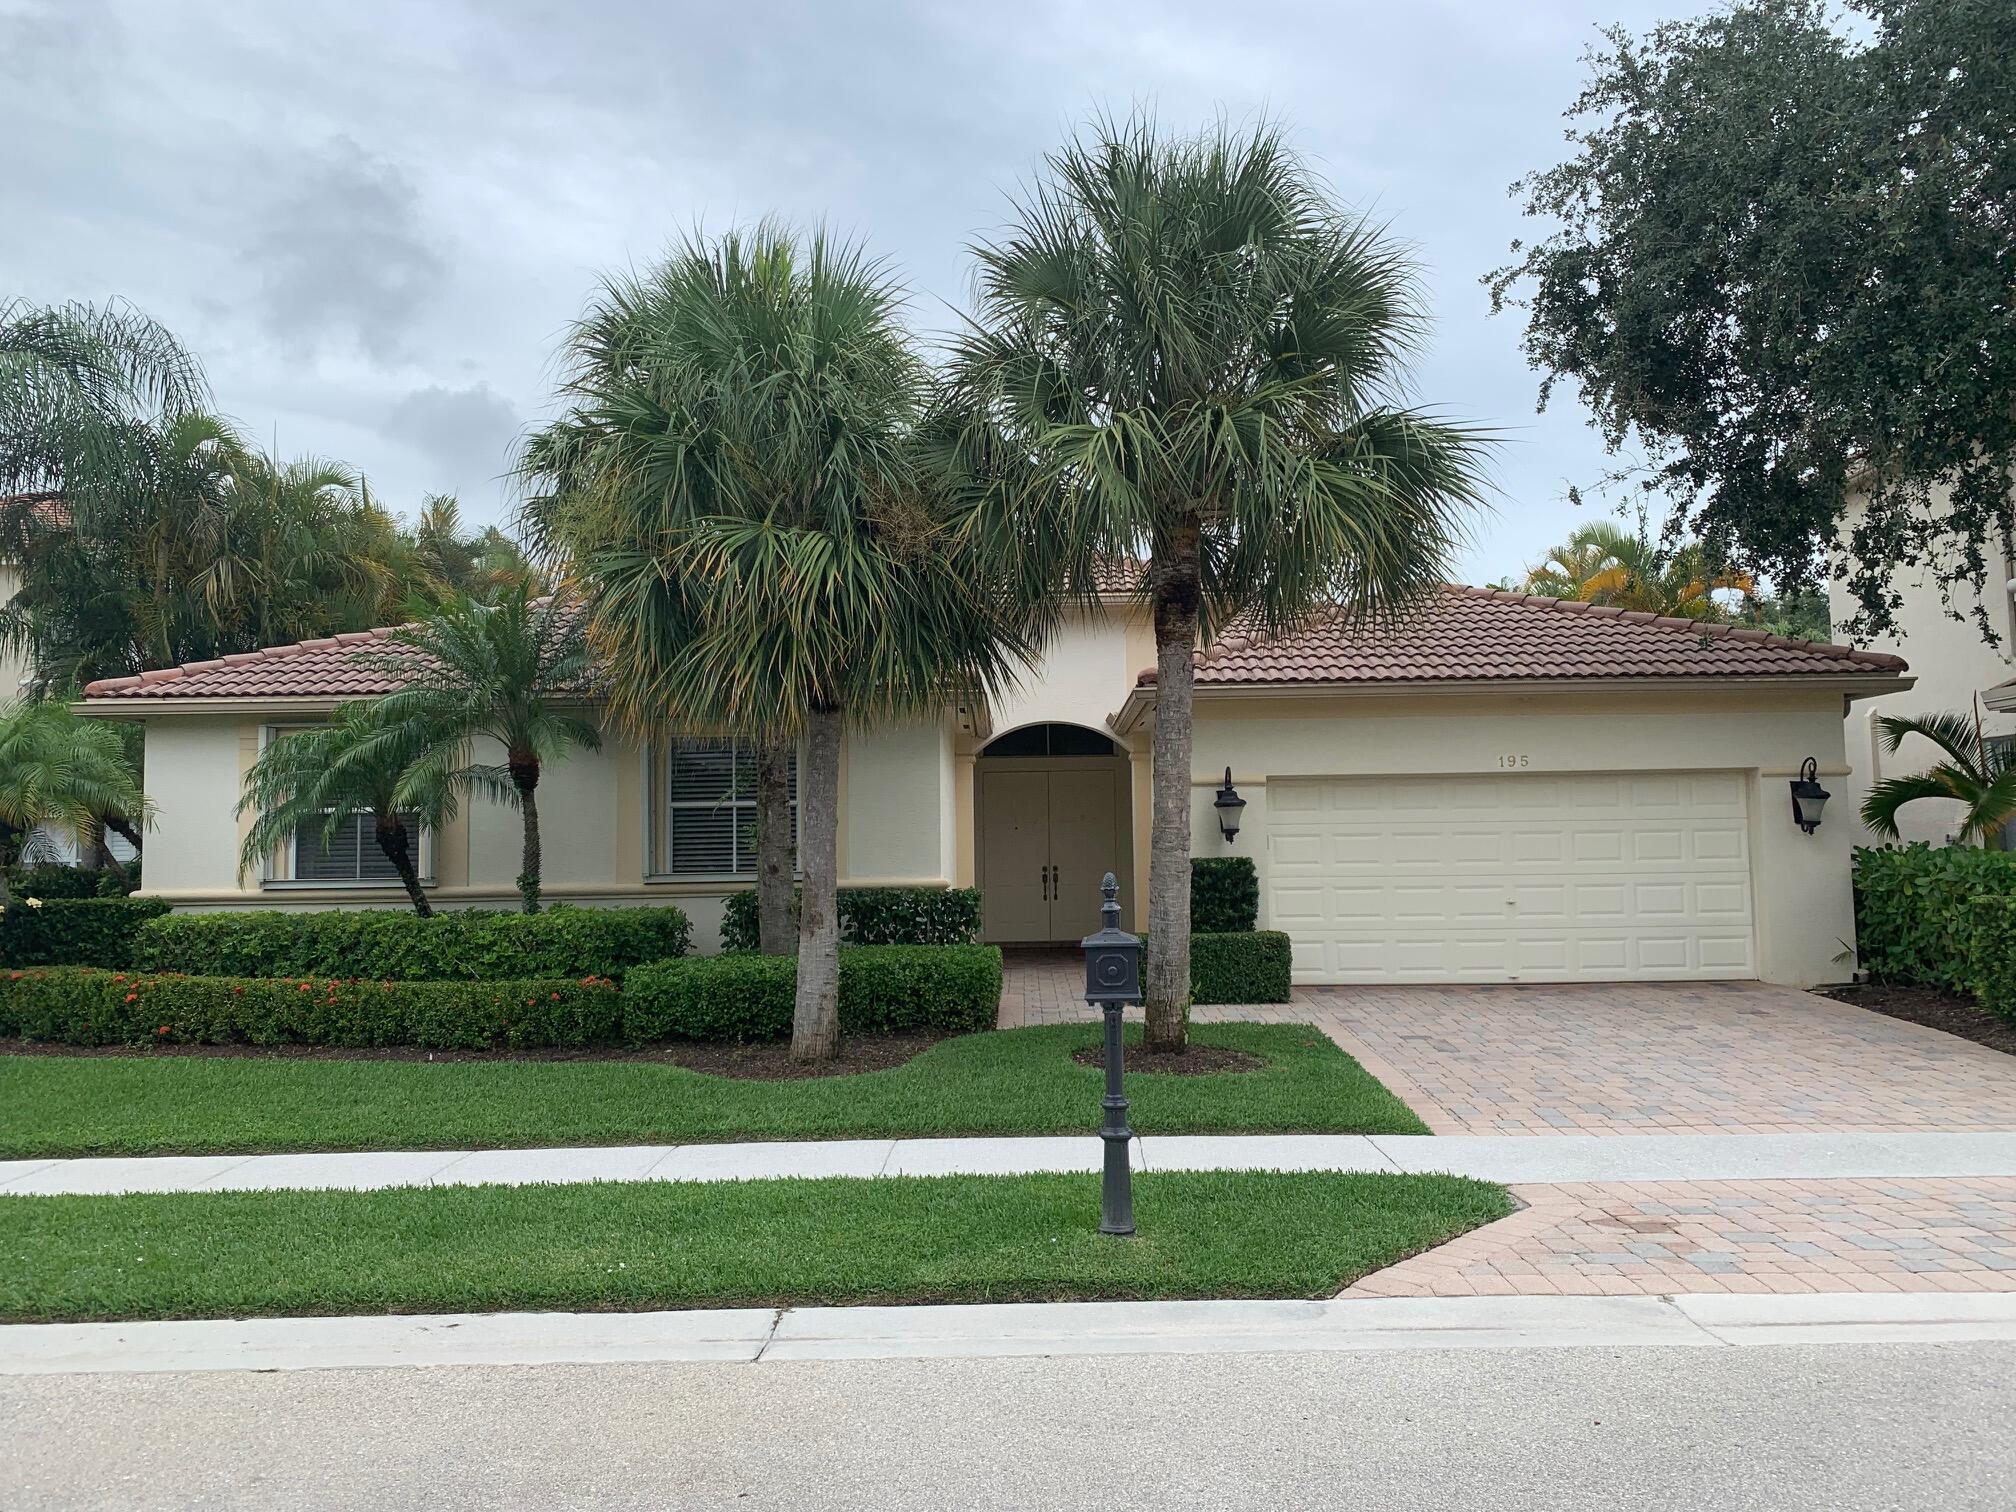 195 Sedona Way, Palm Beach Gardens, Florida 33418, 4 Bedrooms Bedrooms, ,2.1 BathroomsBathrooms,F,Single family,Sedona,RX-10725166